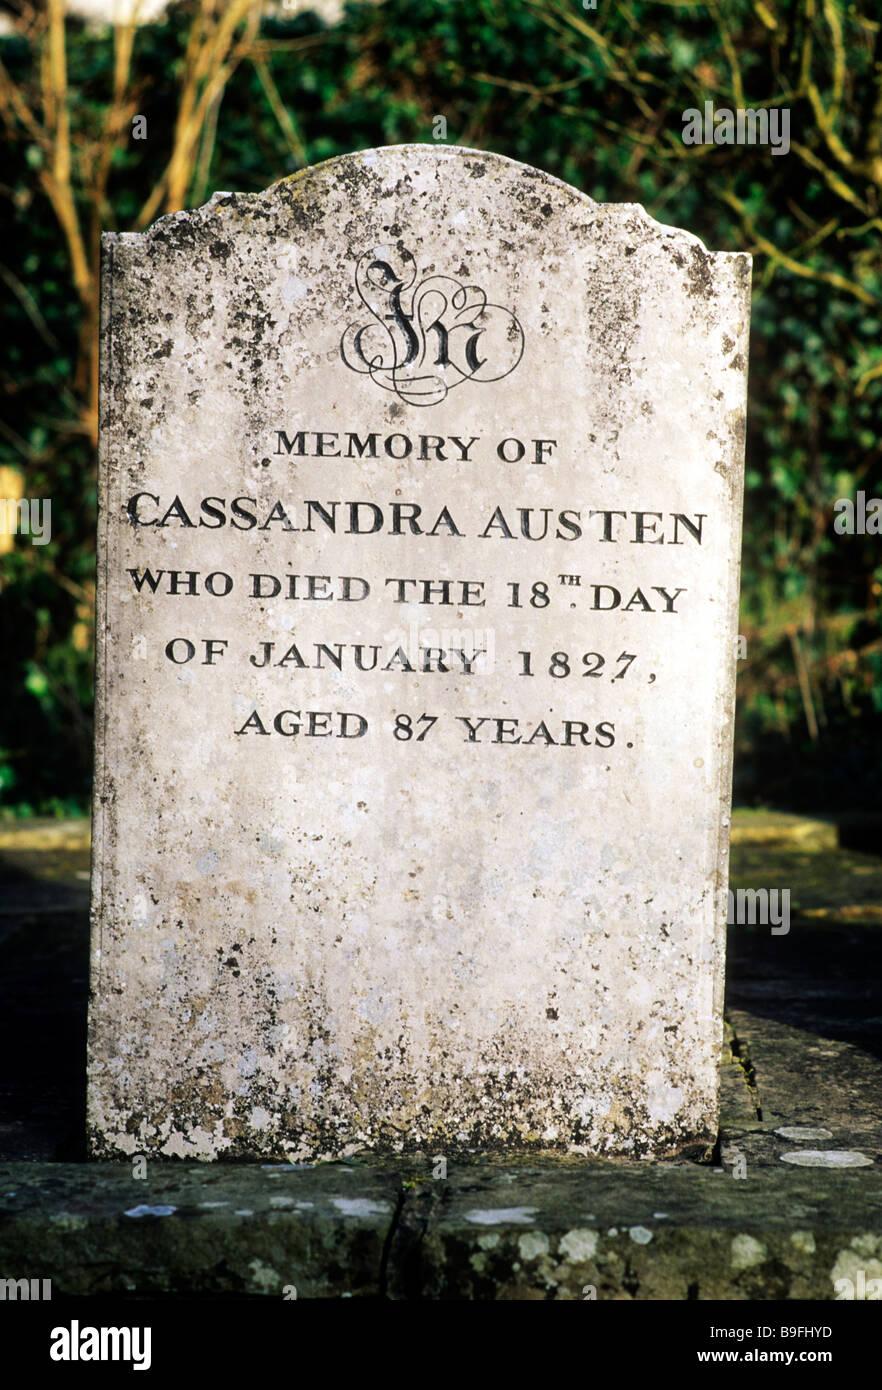 Chawton churchyard Hampshire England UK Gravestone to Cassandra Austen 1827 mother of Jane Austen English novelist - Stock Image